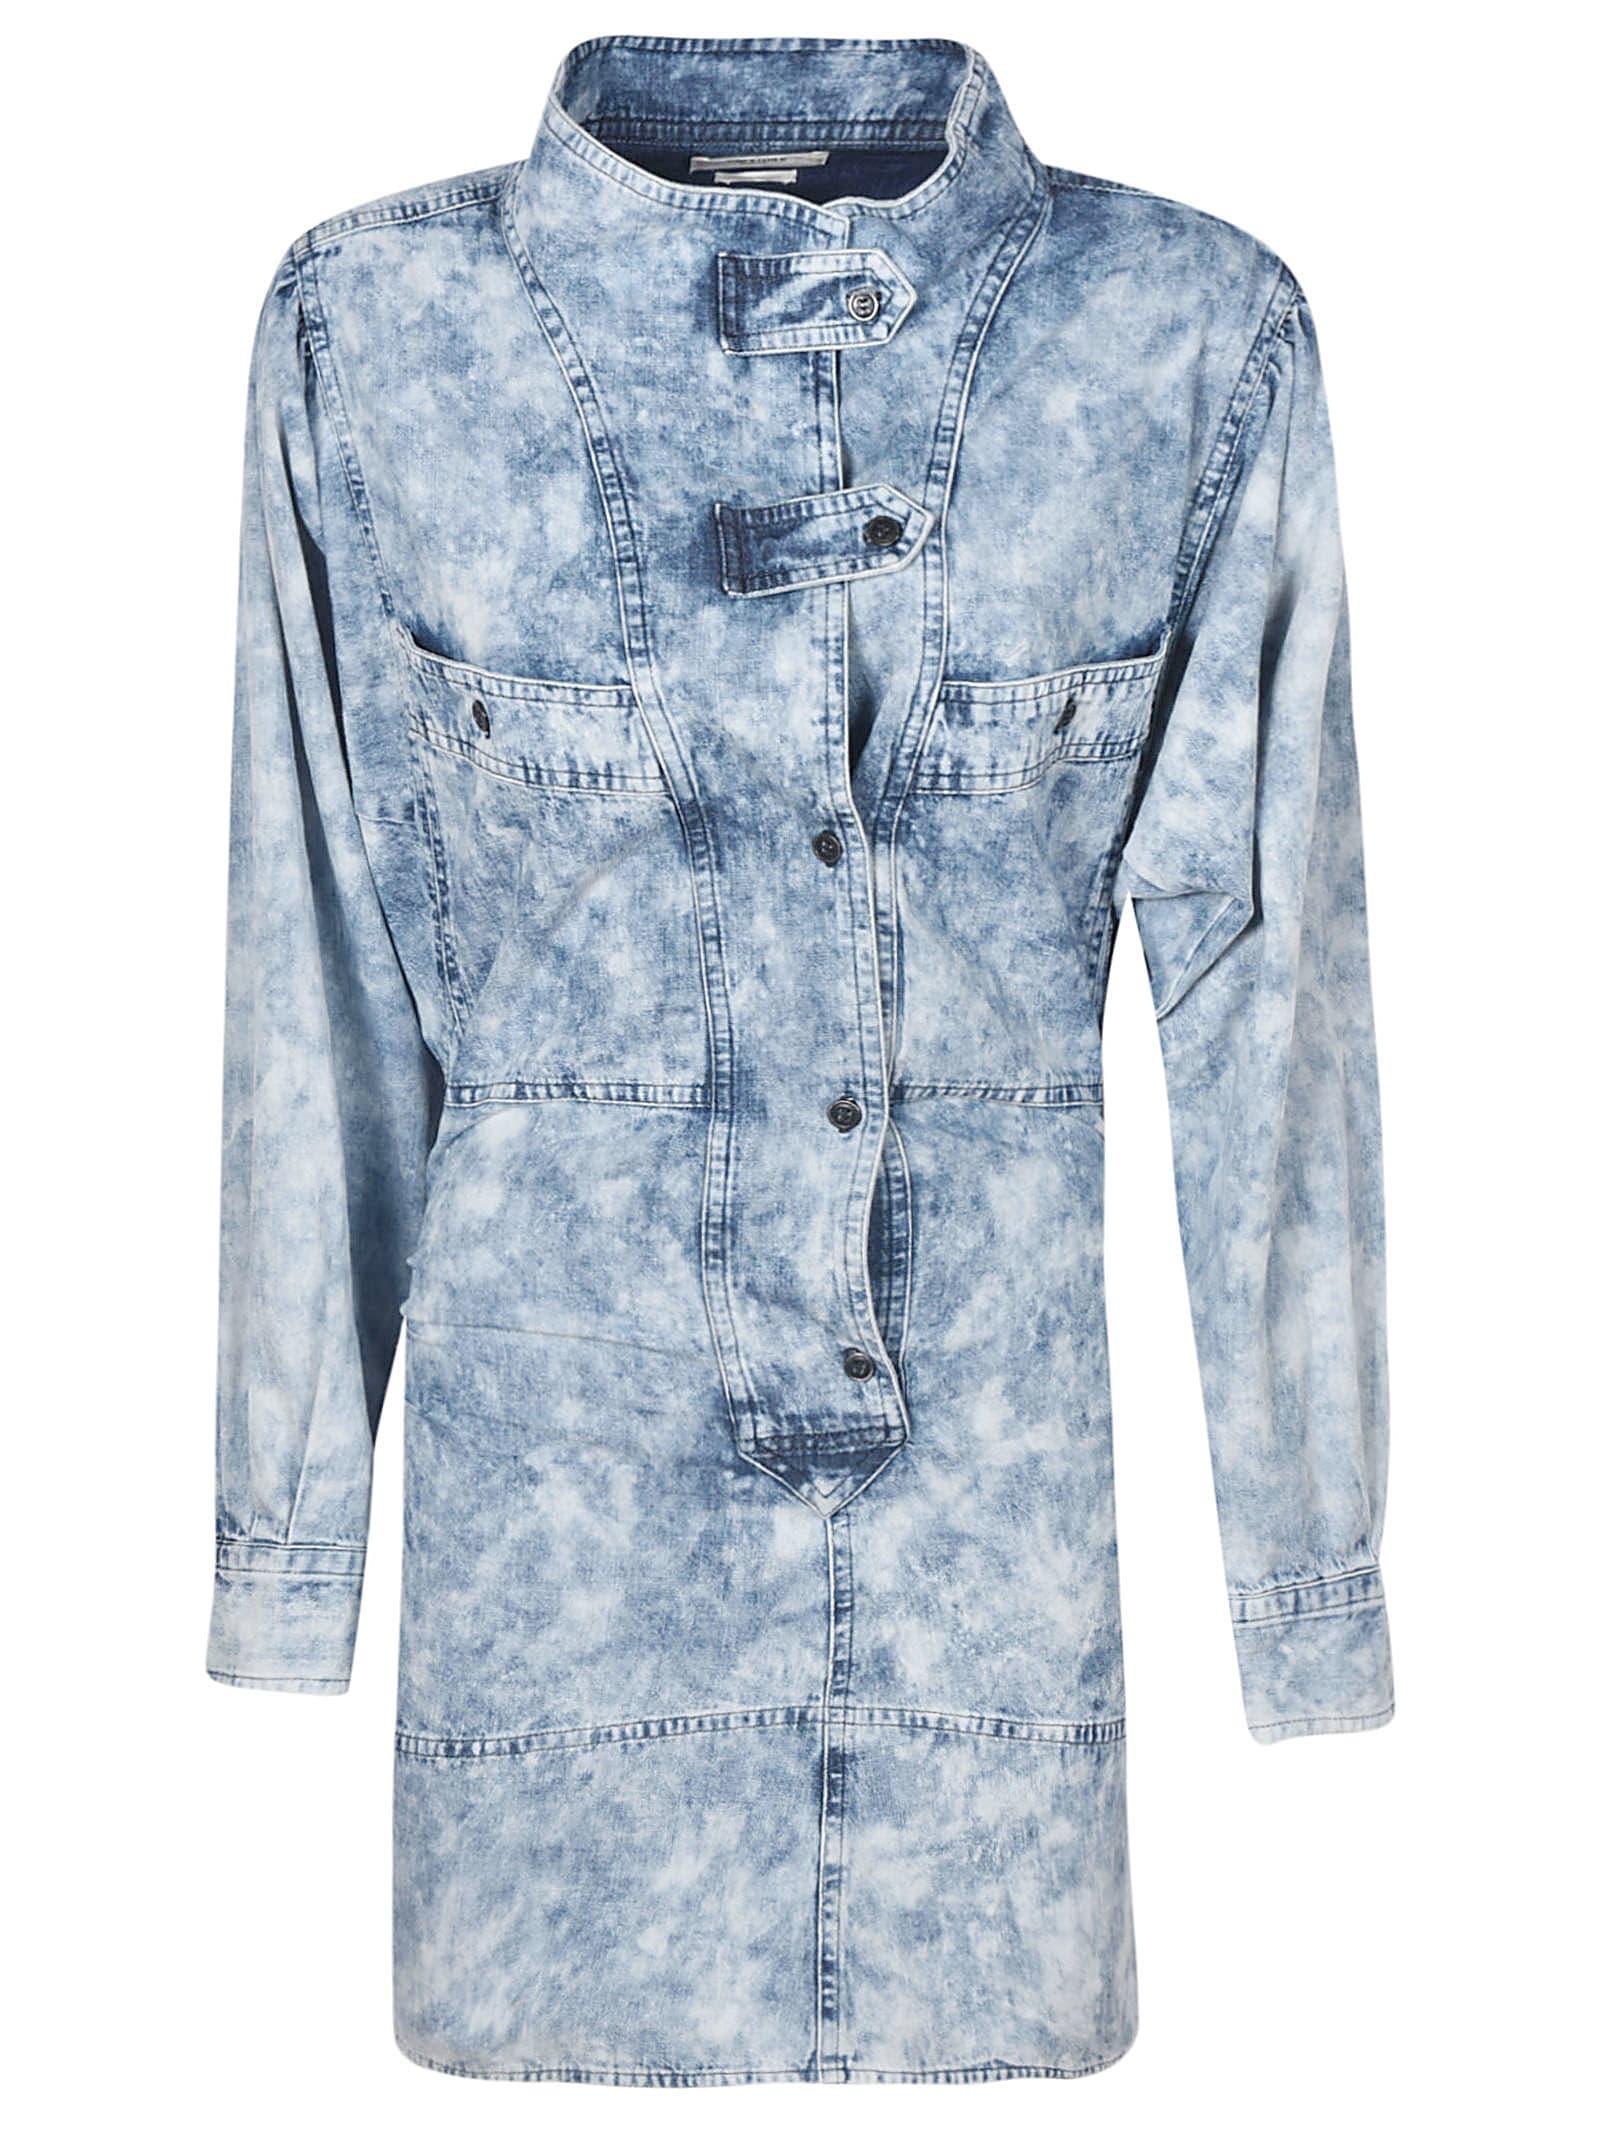 Buy Isabel Marant Étoile Inaroa Dress online, shop Isabel Marant Étoile with free shipping